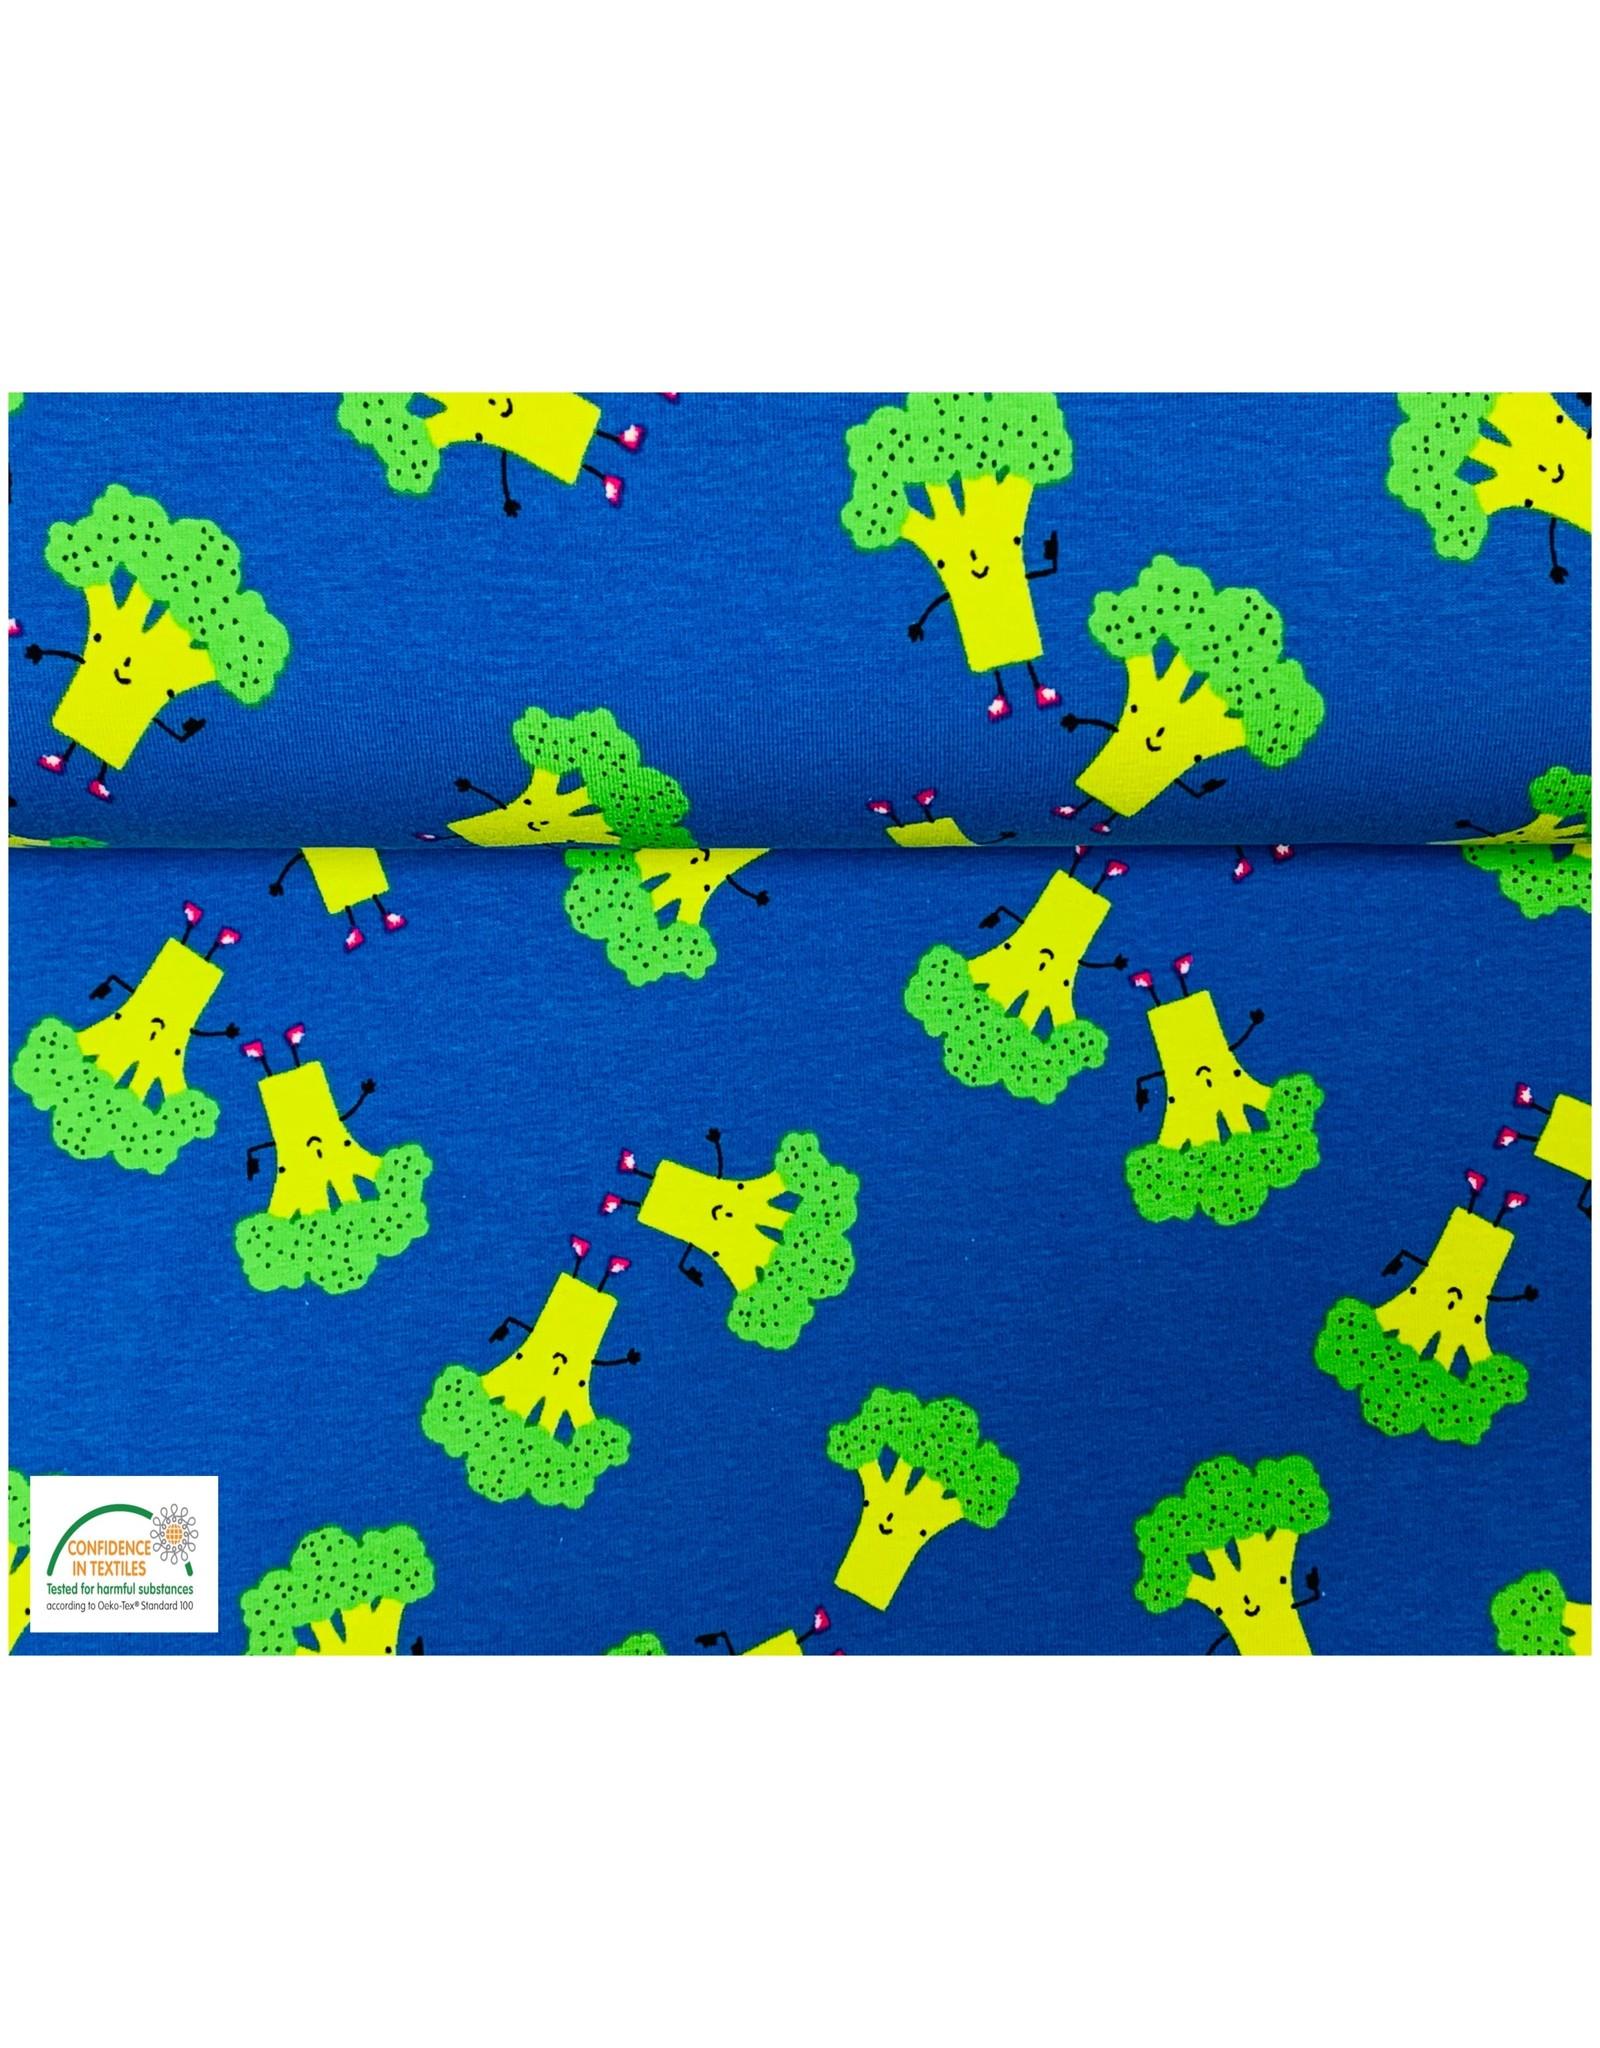 Tricot katoen Broccoli - Kobalt